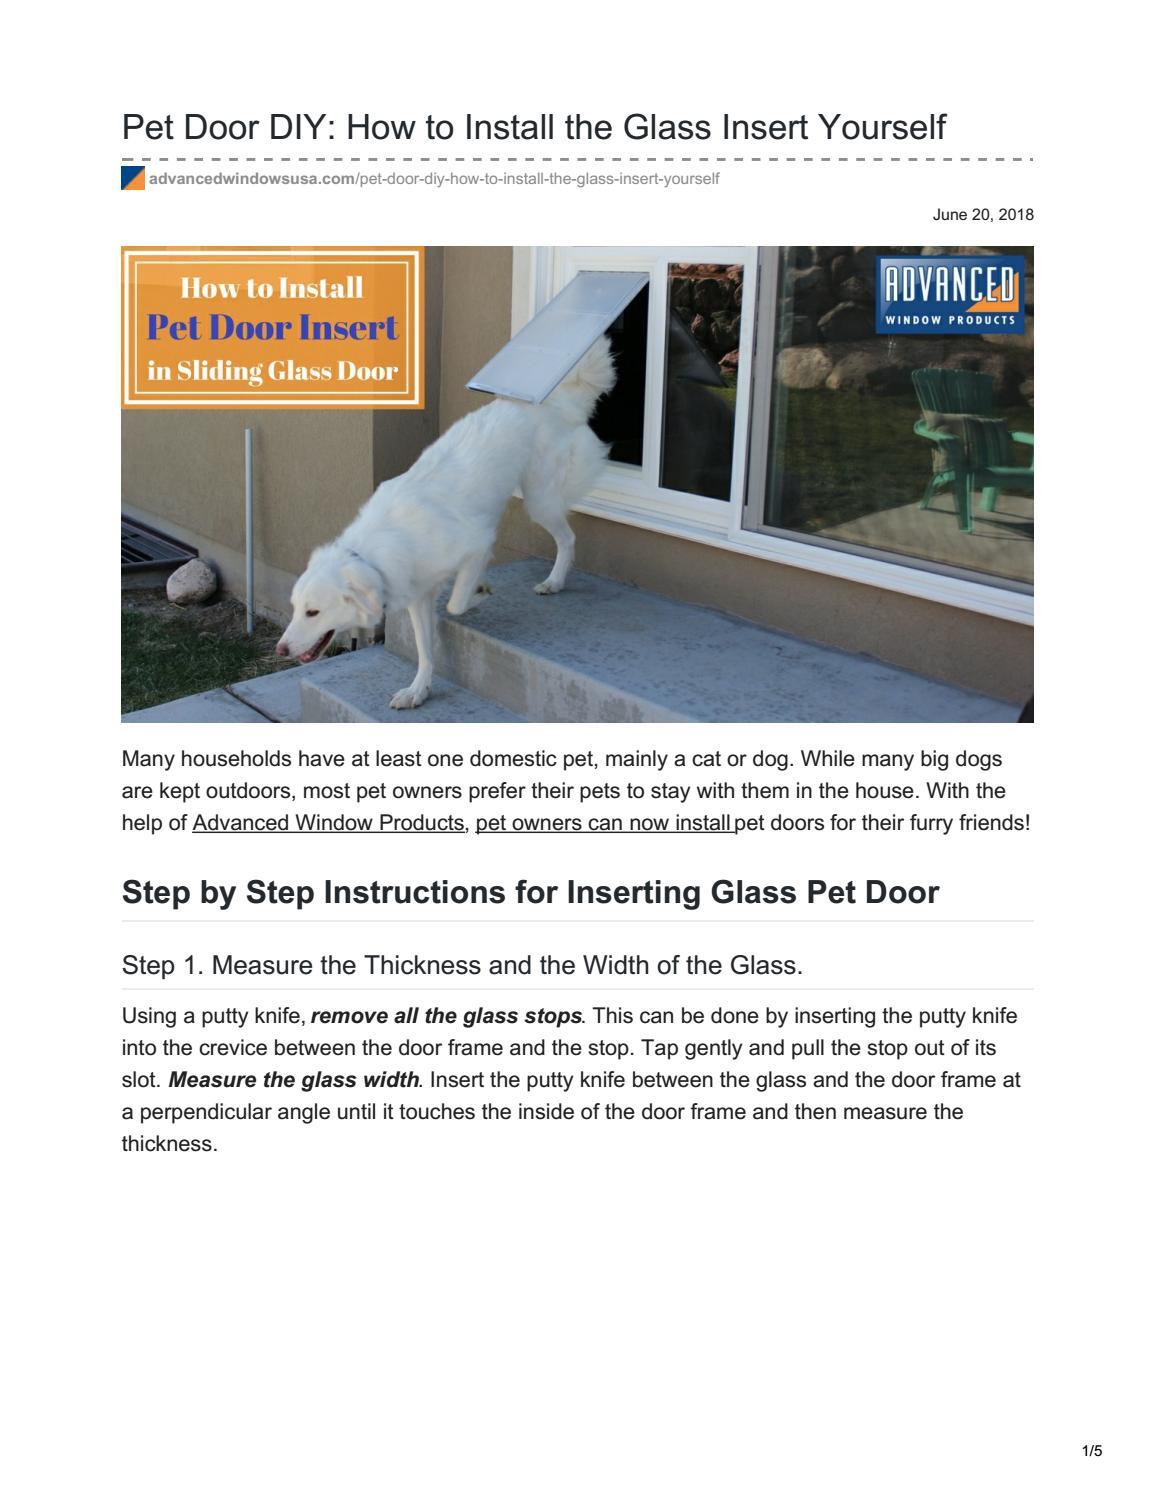 Pet Door Diy How To Install The Glass Insert Yourself By Advancedwindowsut Issuu